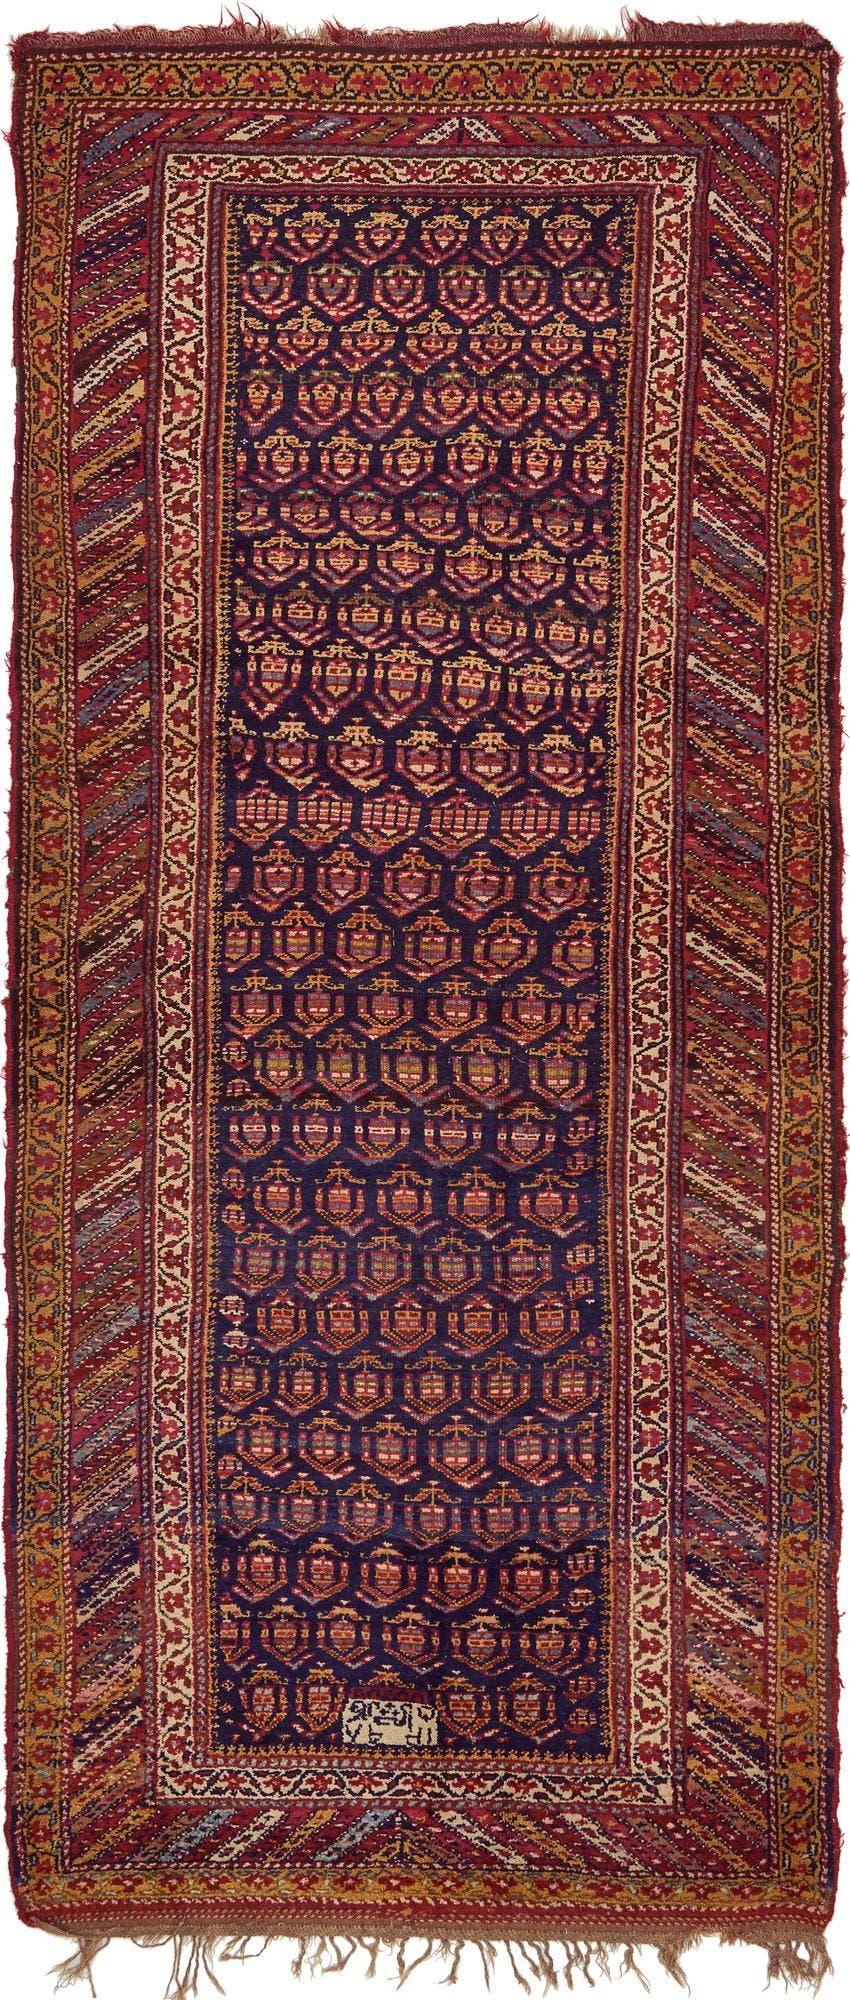 5' x 11' 4 Shiraz Persian Runner Rug main image